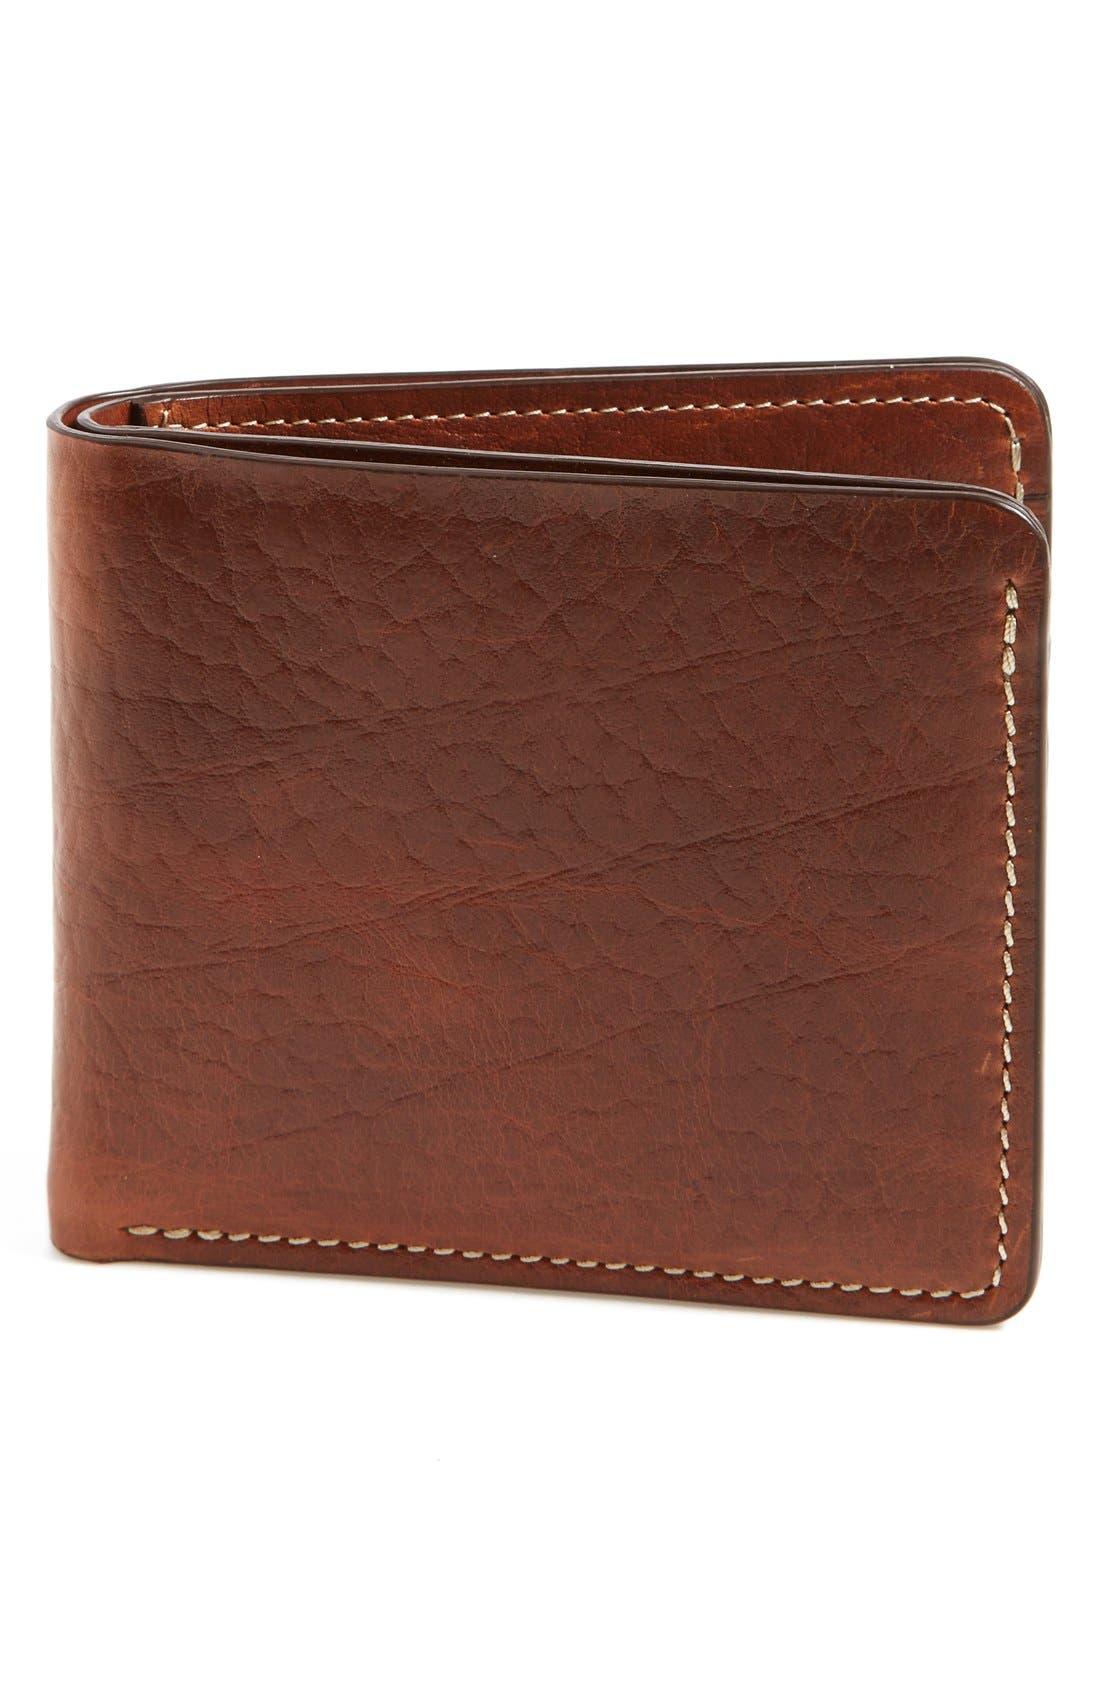 'Jackson' Bison Leather Wallet,                             Main thumbnail 1, color,                             700